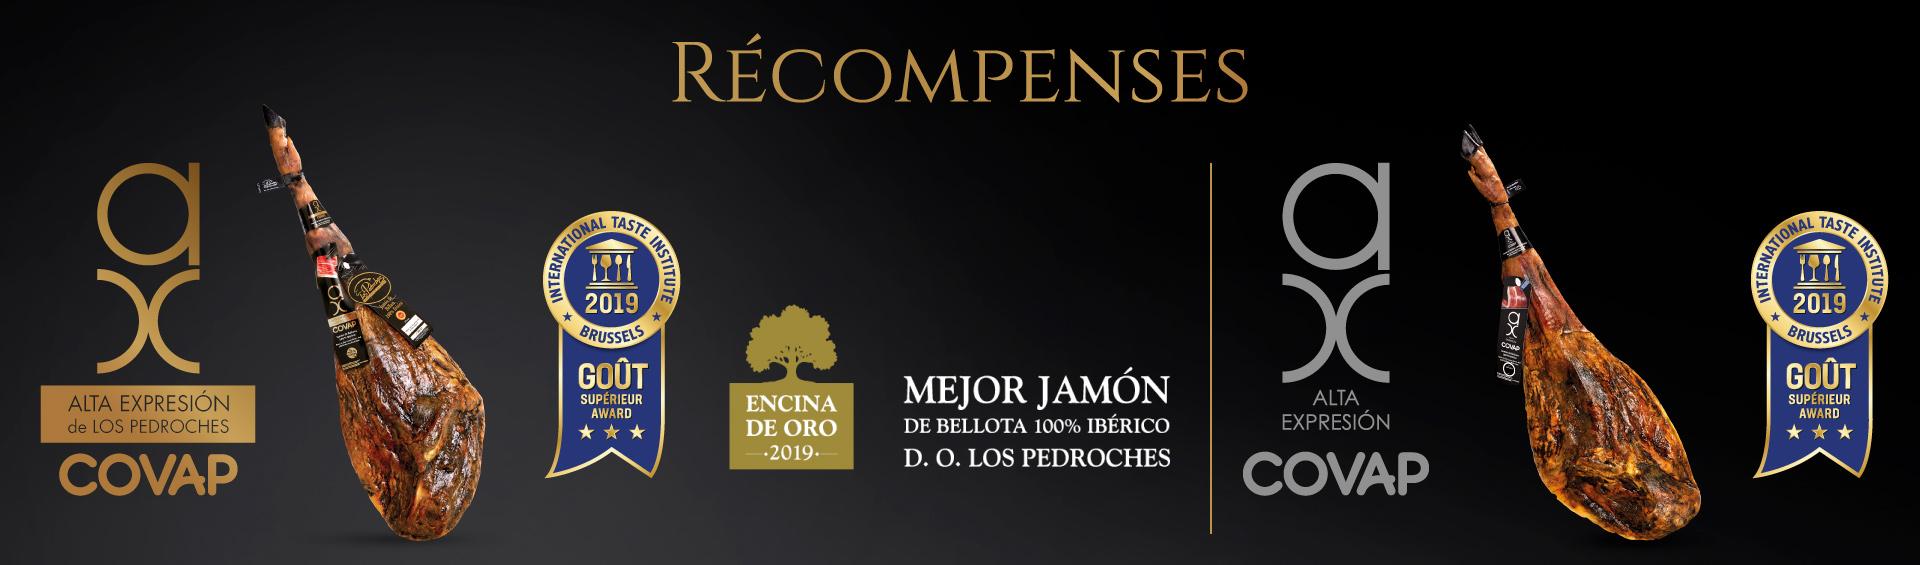 Premios 2019 a Ibericos COVAP | COVAP